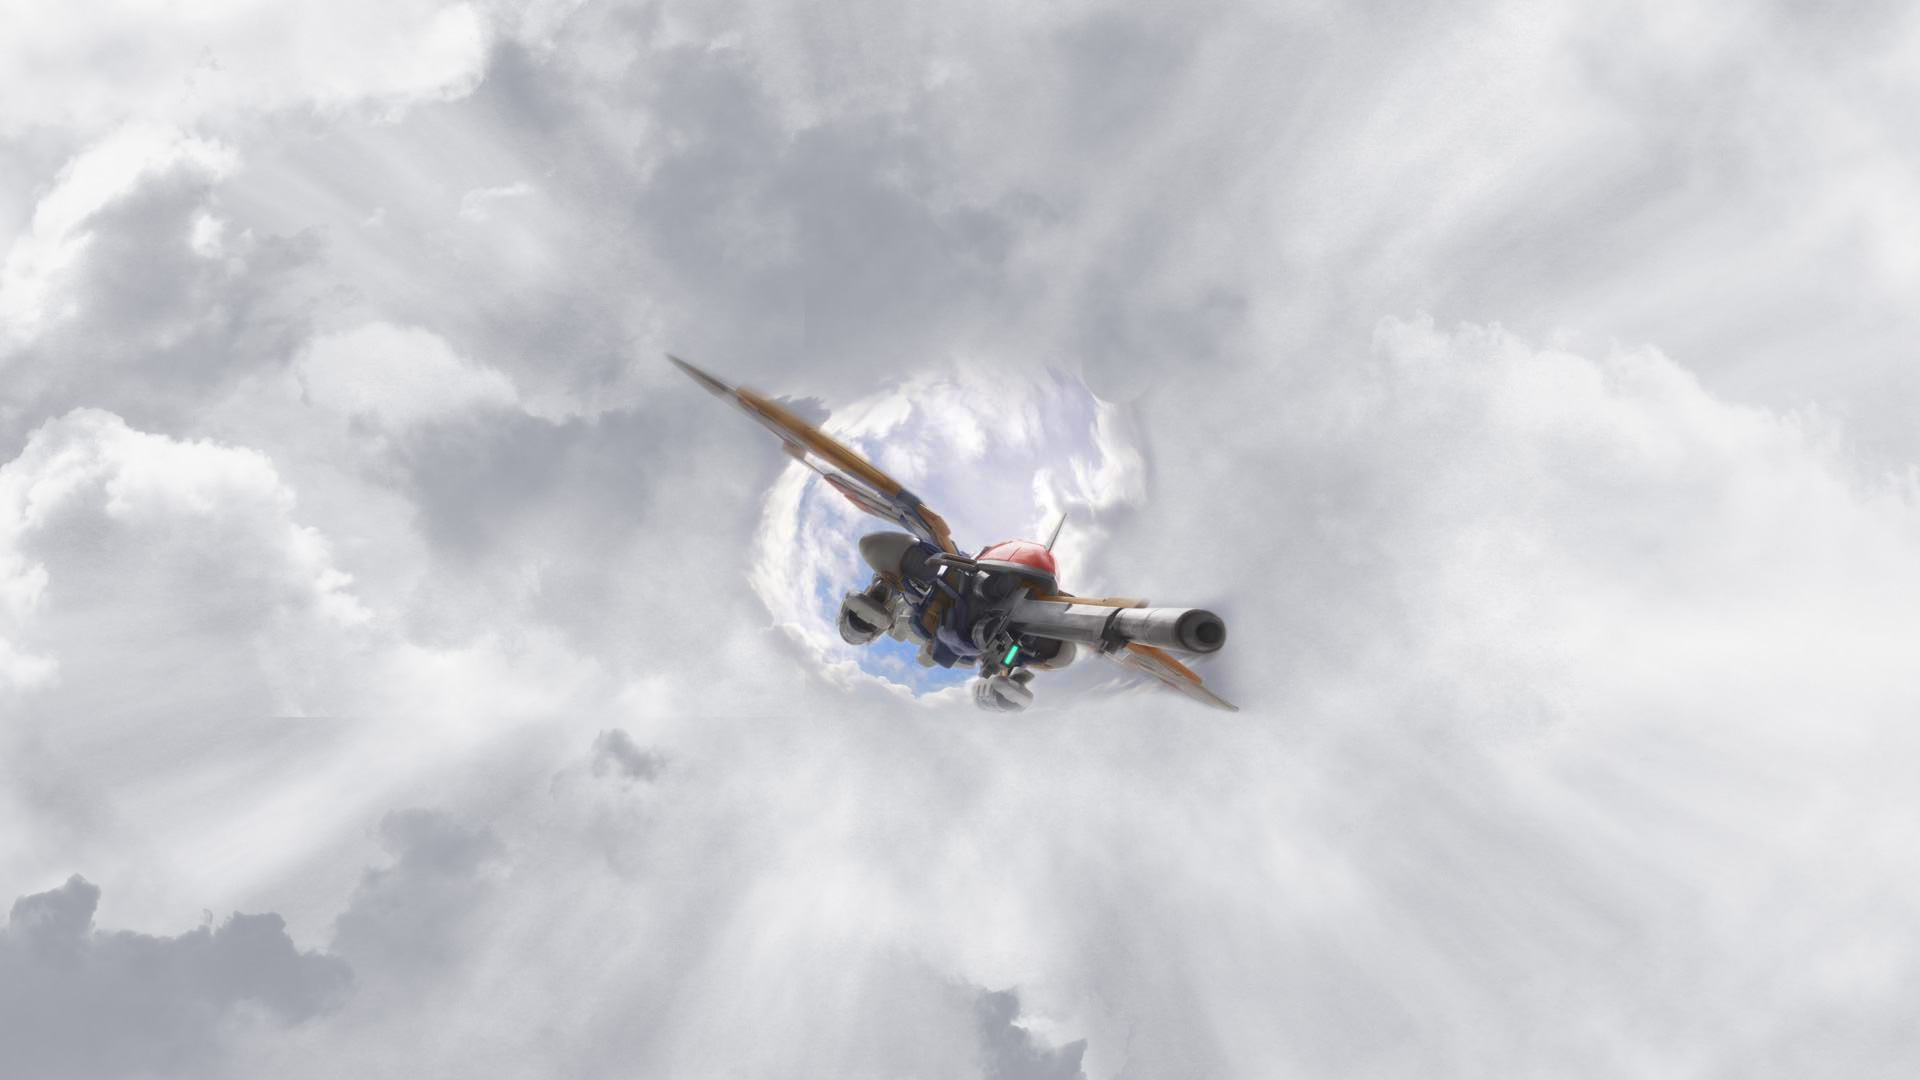 Hd Gundam Themes: Gundam HD Wallpaper